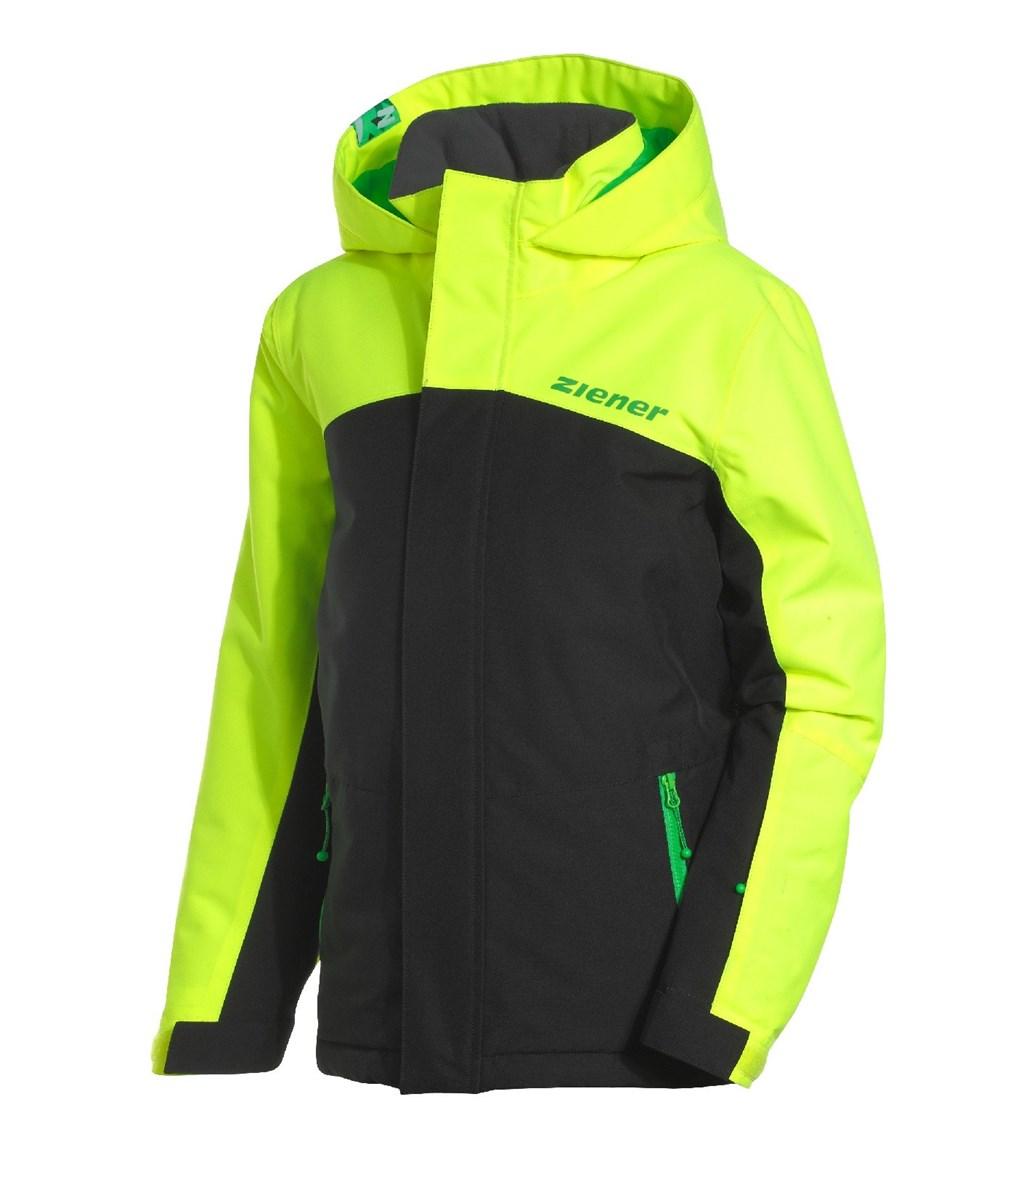 5f108ff4e Ziener Aladin Boys Ski Jacket Black